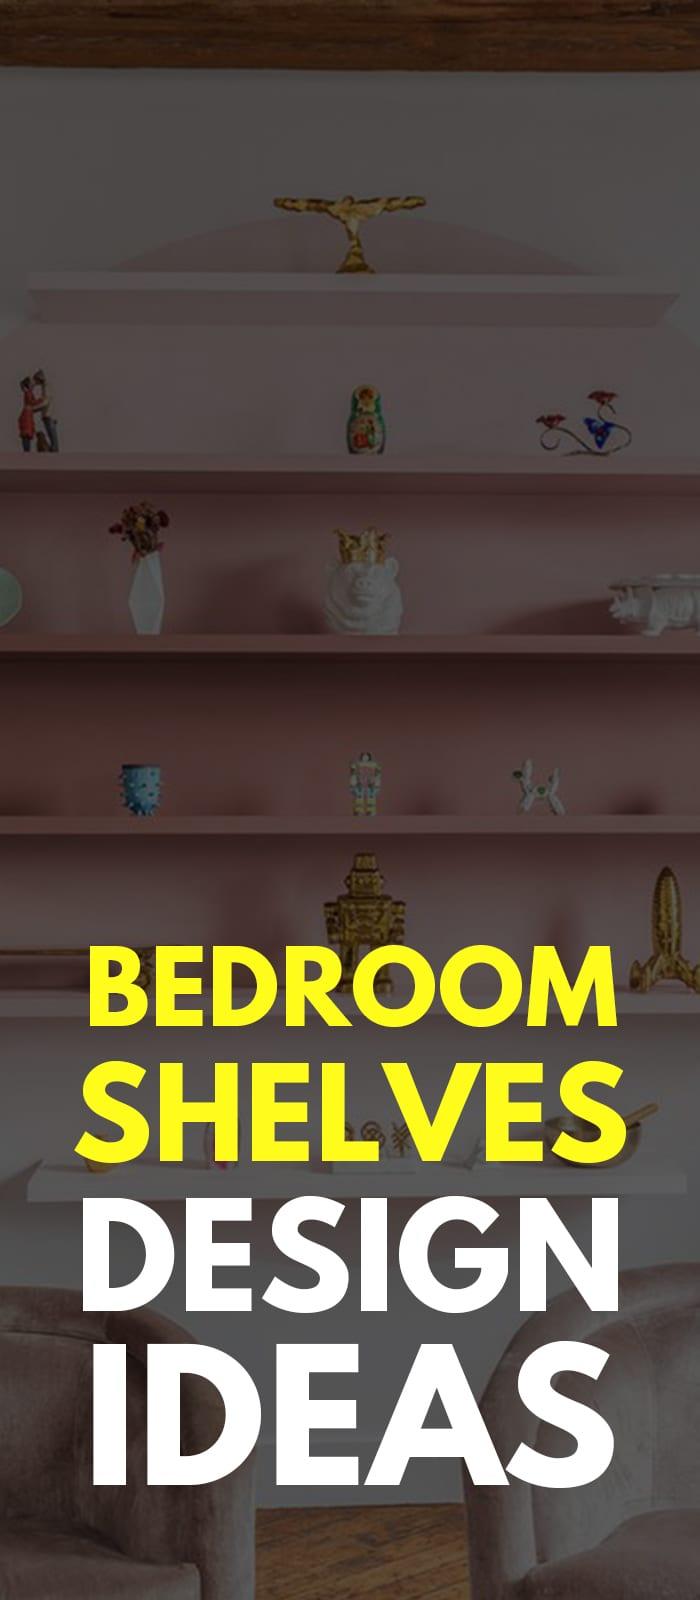 Circular bedroom shelves.